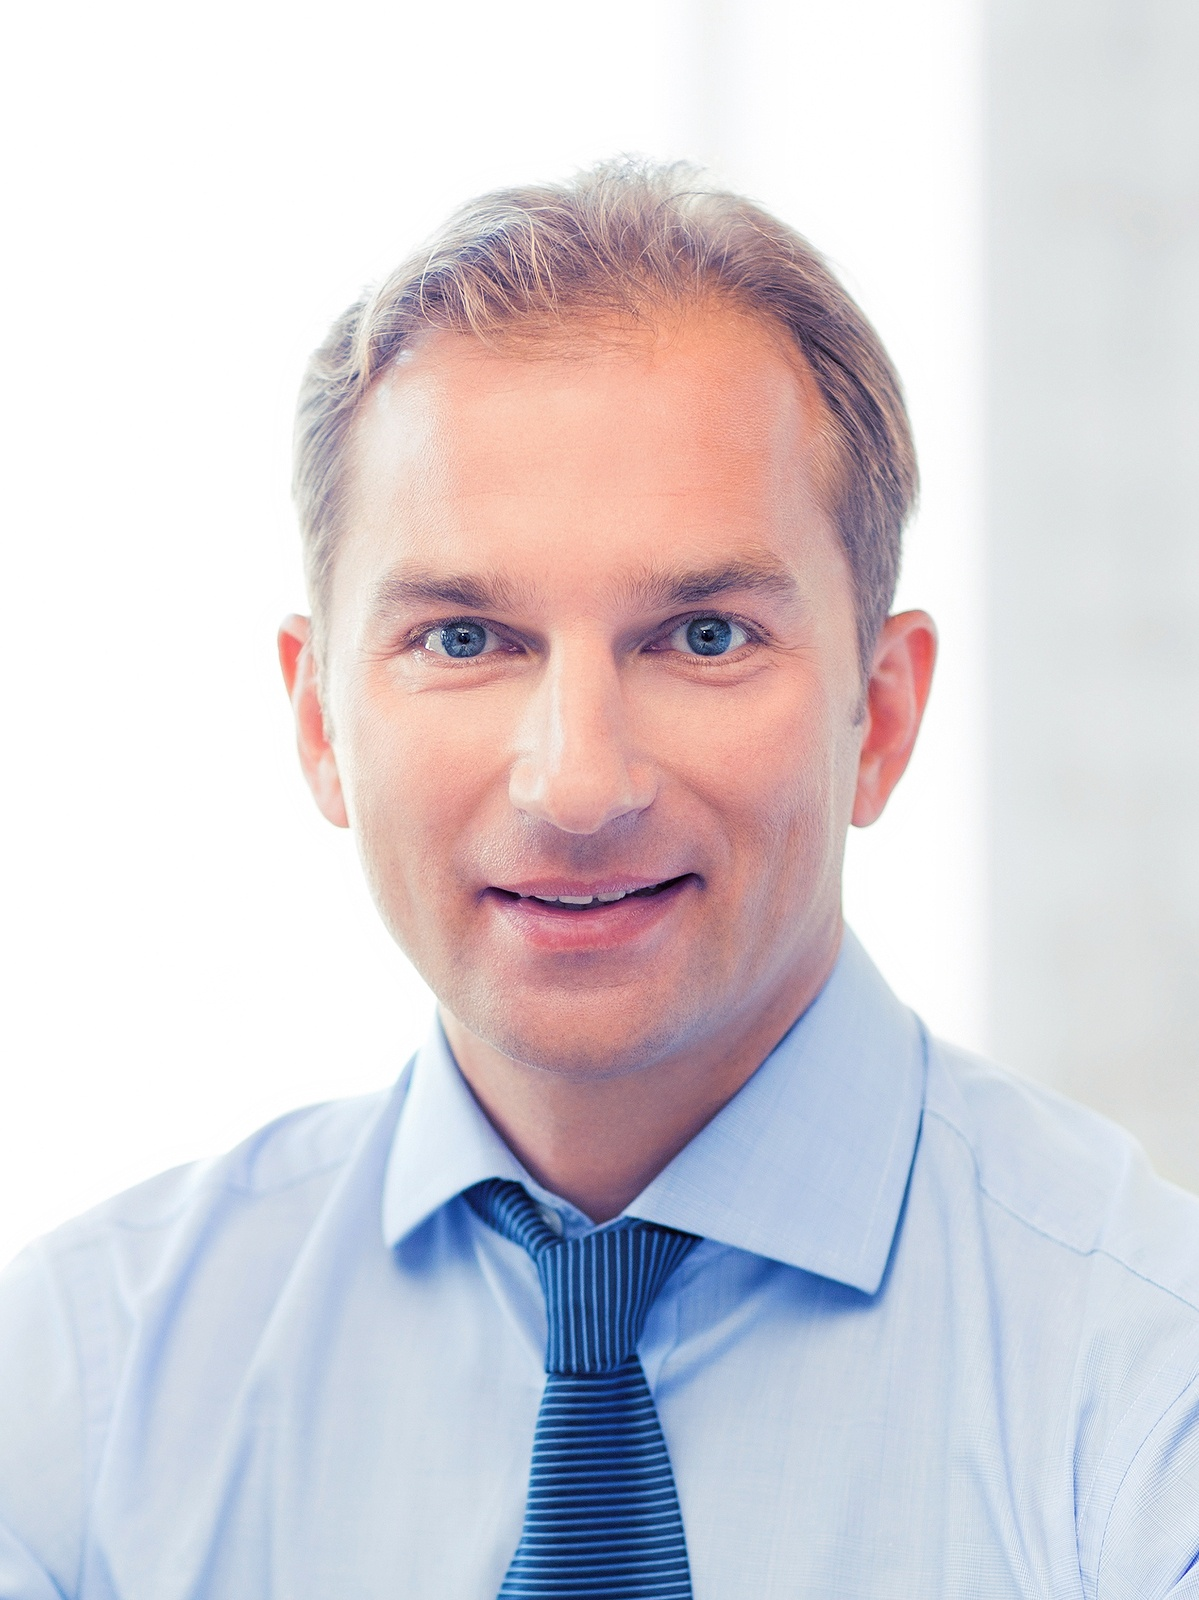 bigstock-smiling-middle-aged-businessma-138509663.jpg